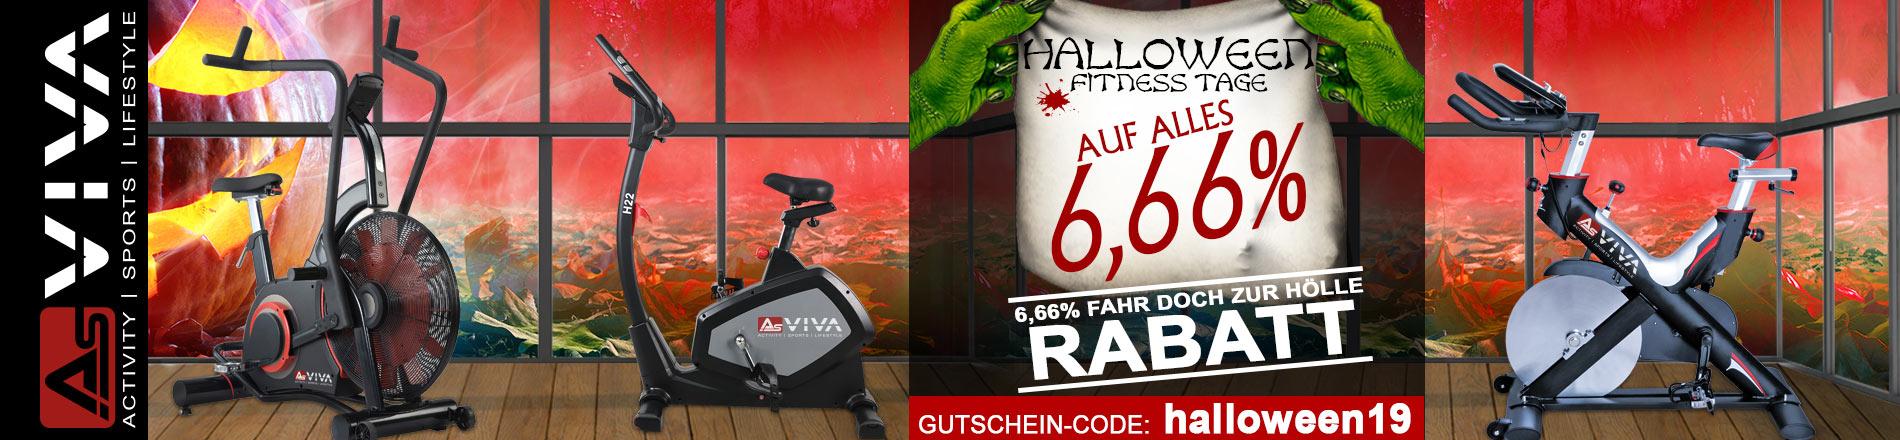 Halloween Fitness Tage 6,66% Rabatt-Gutschein Aktion für AsVIVA Fitnessgeräte, E-Bikes, Gartenmöbel & Keramikgrills